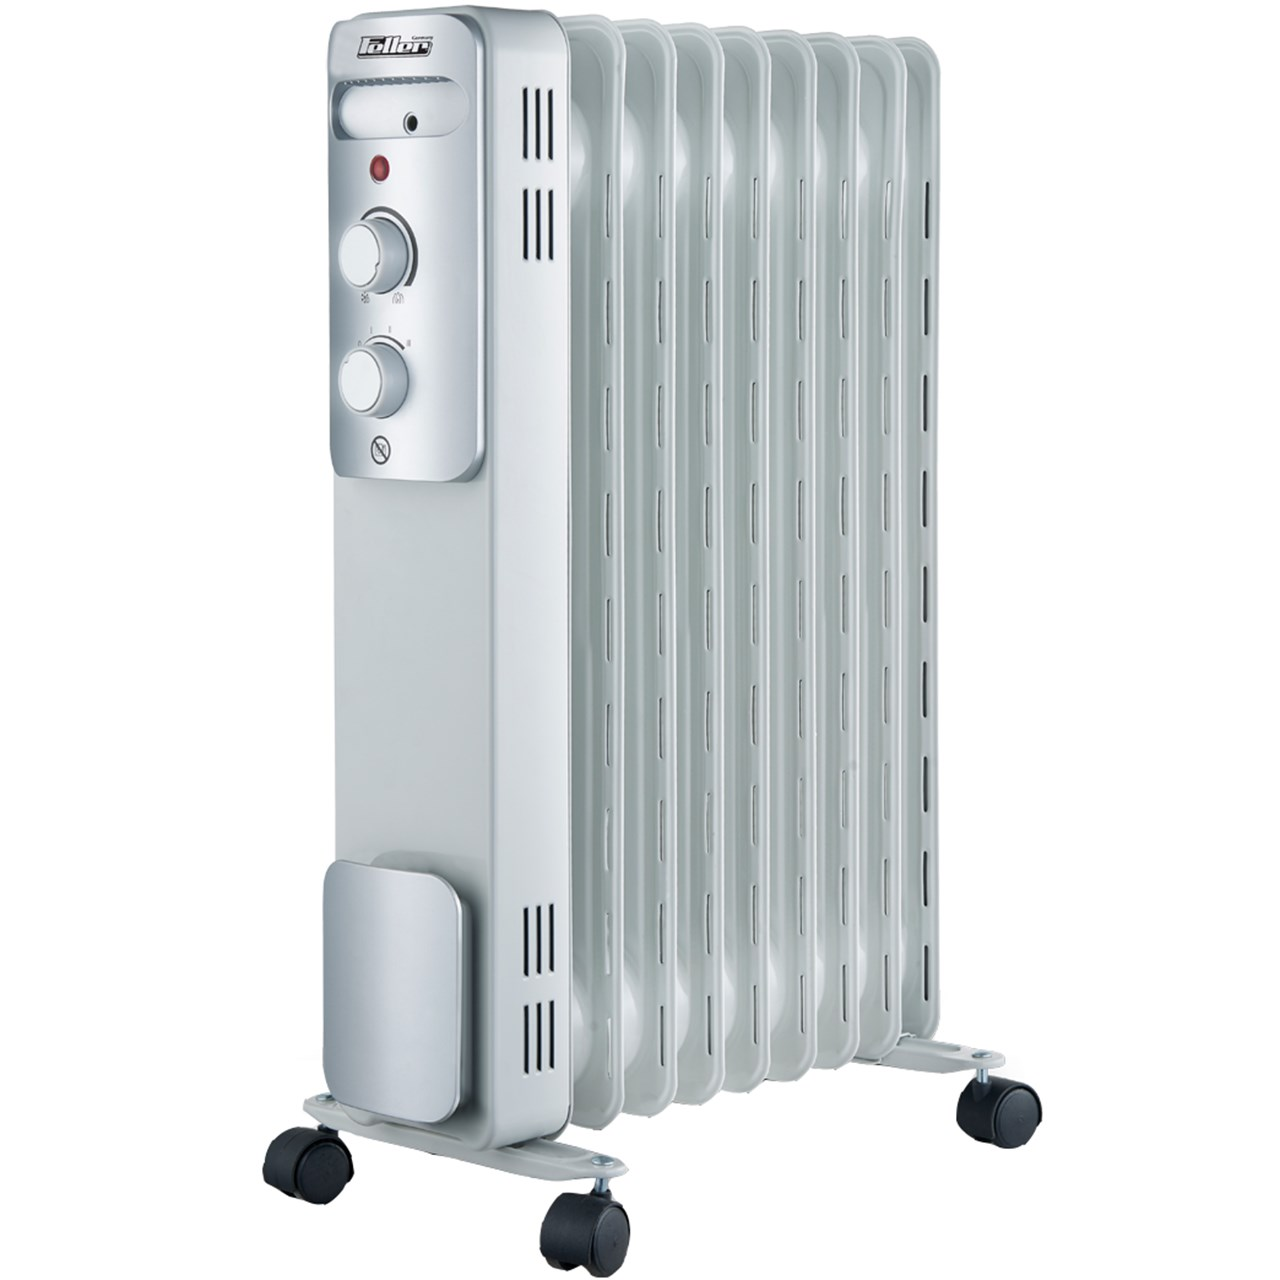 شوفاژ برقی فلر مدل OR20090